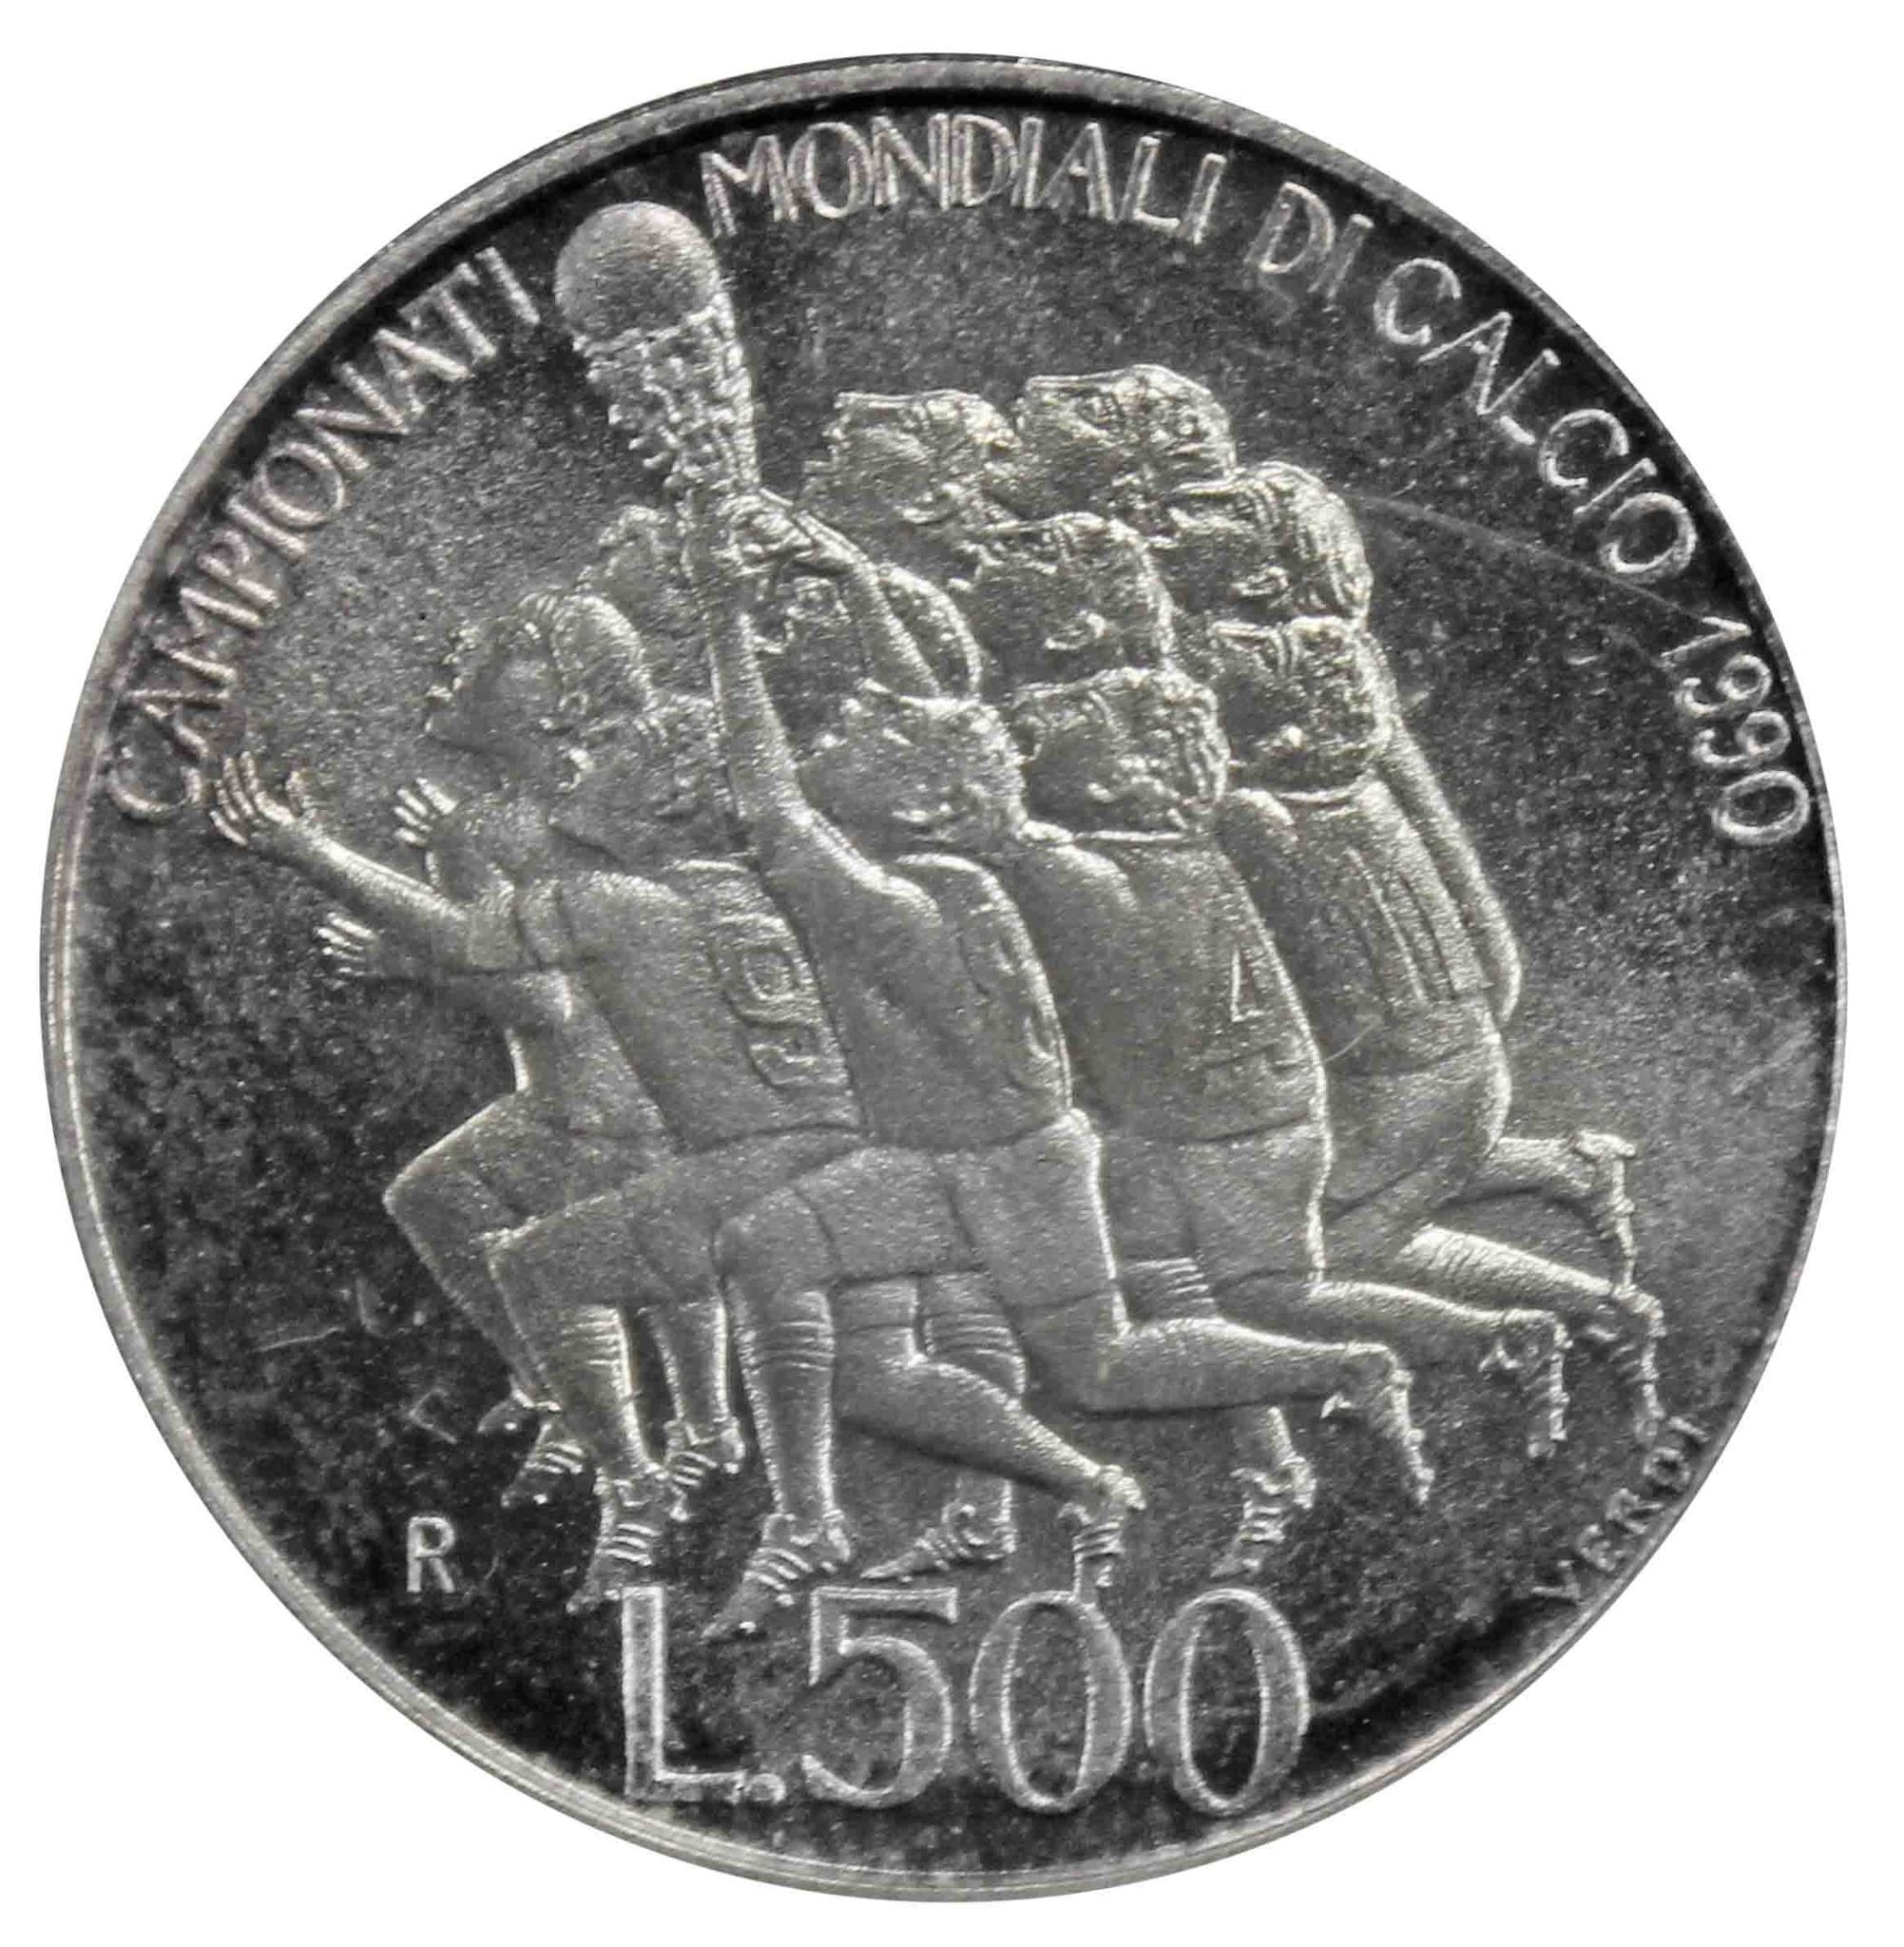 500 лир Чемпионат мира по футболу 1990 года. Сан-Марино. 1990 год Серебро. UNC.